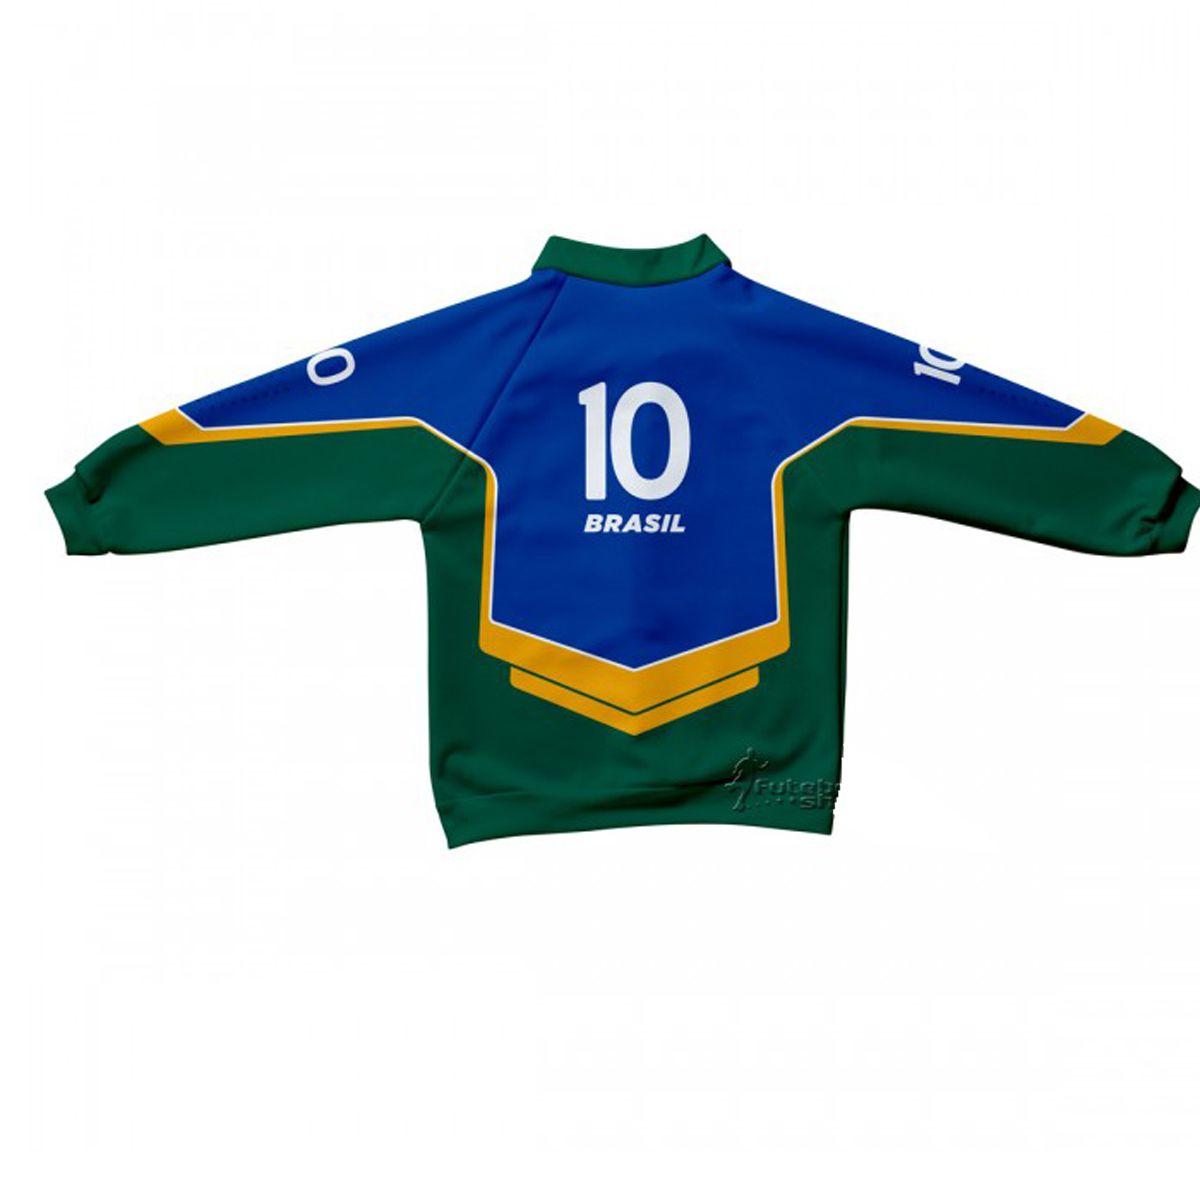 Jaqueta Infantil do Brasil Malha Esportiva Estilo - 224S